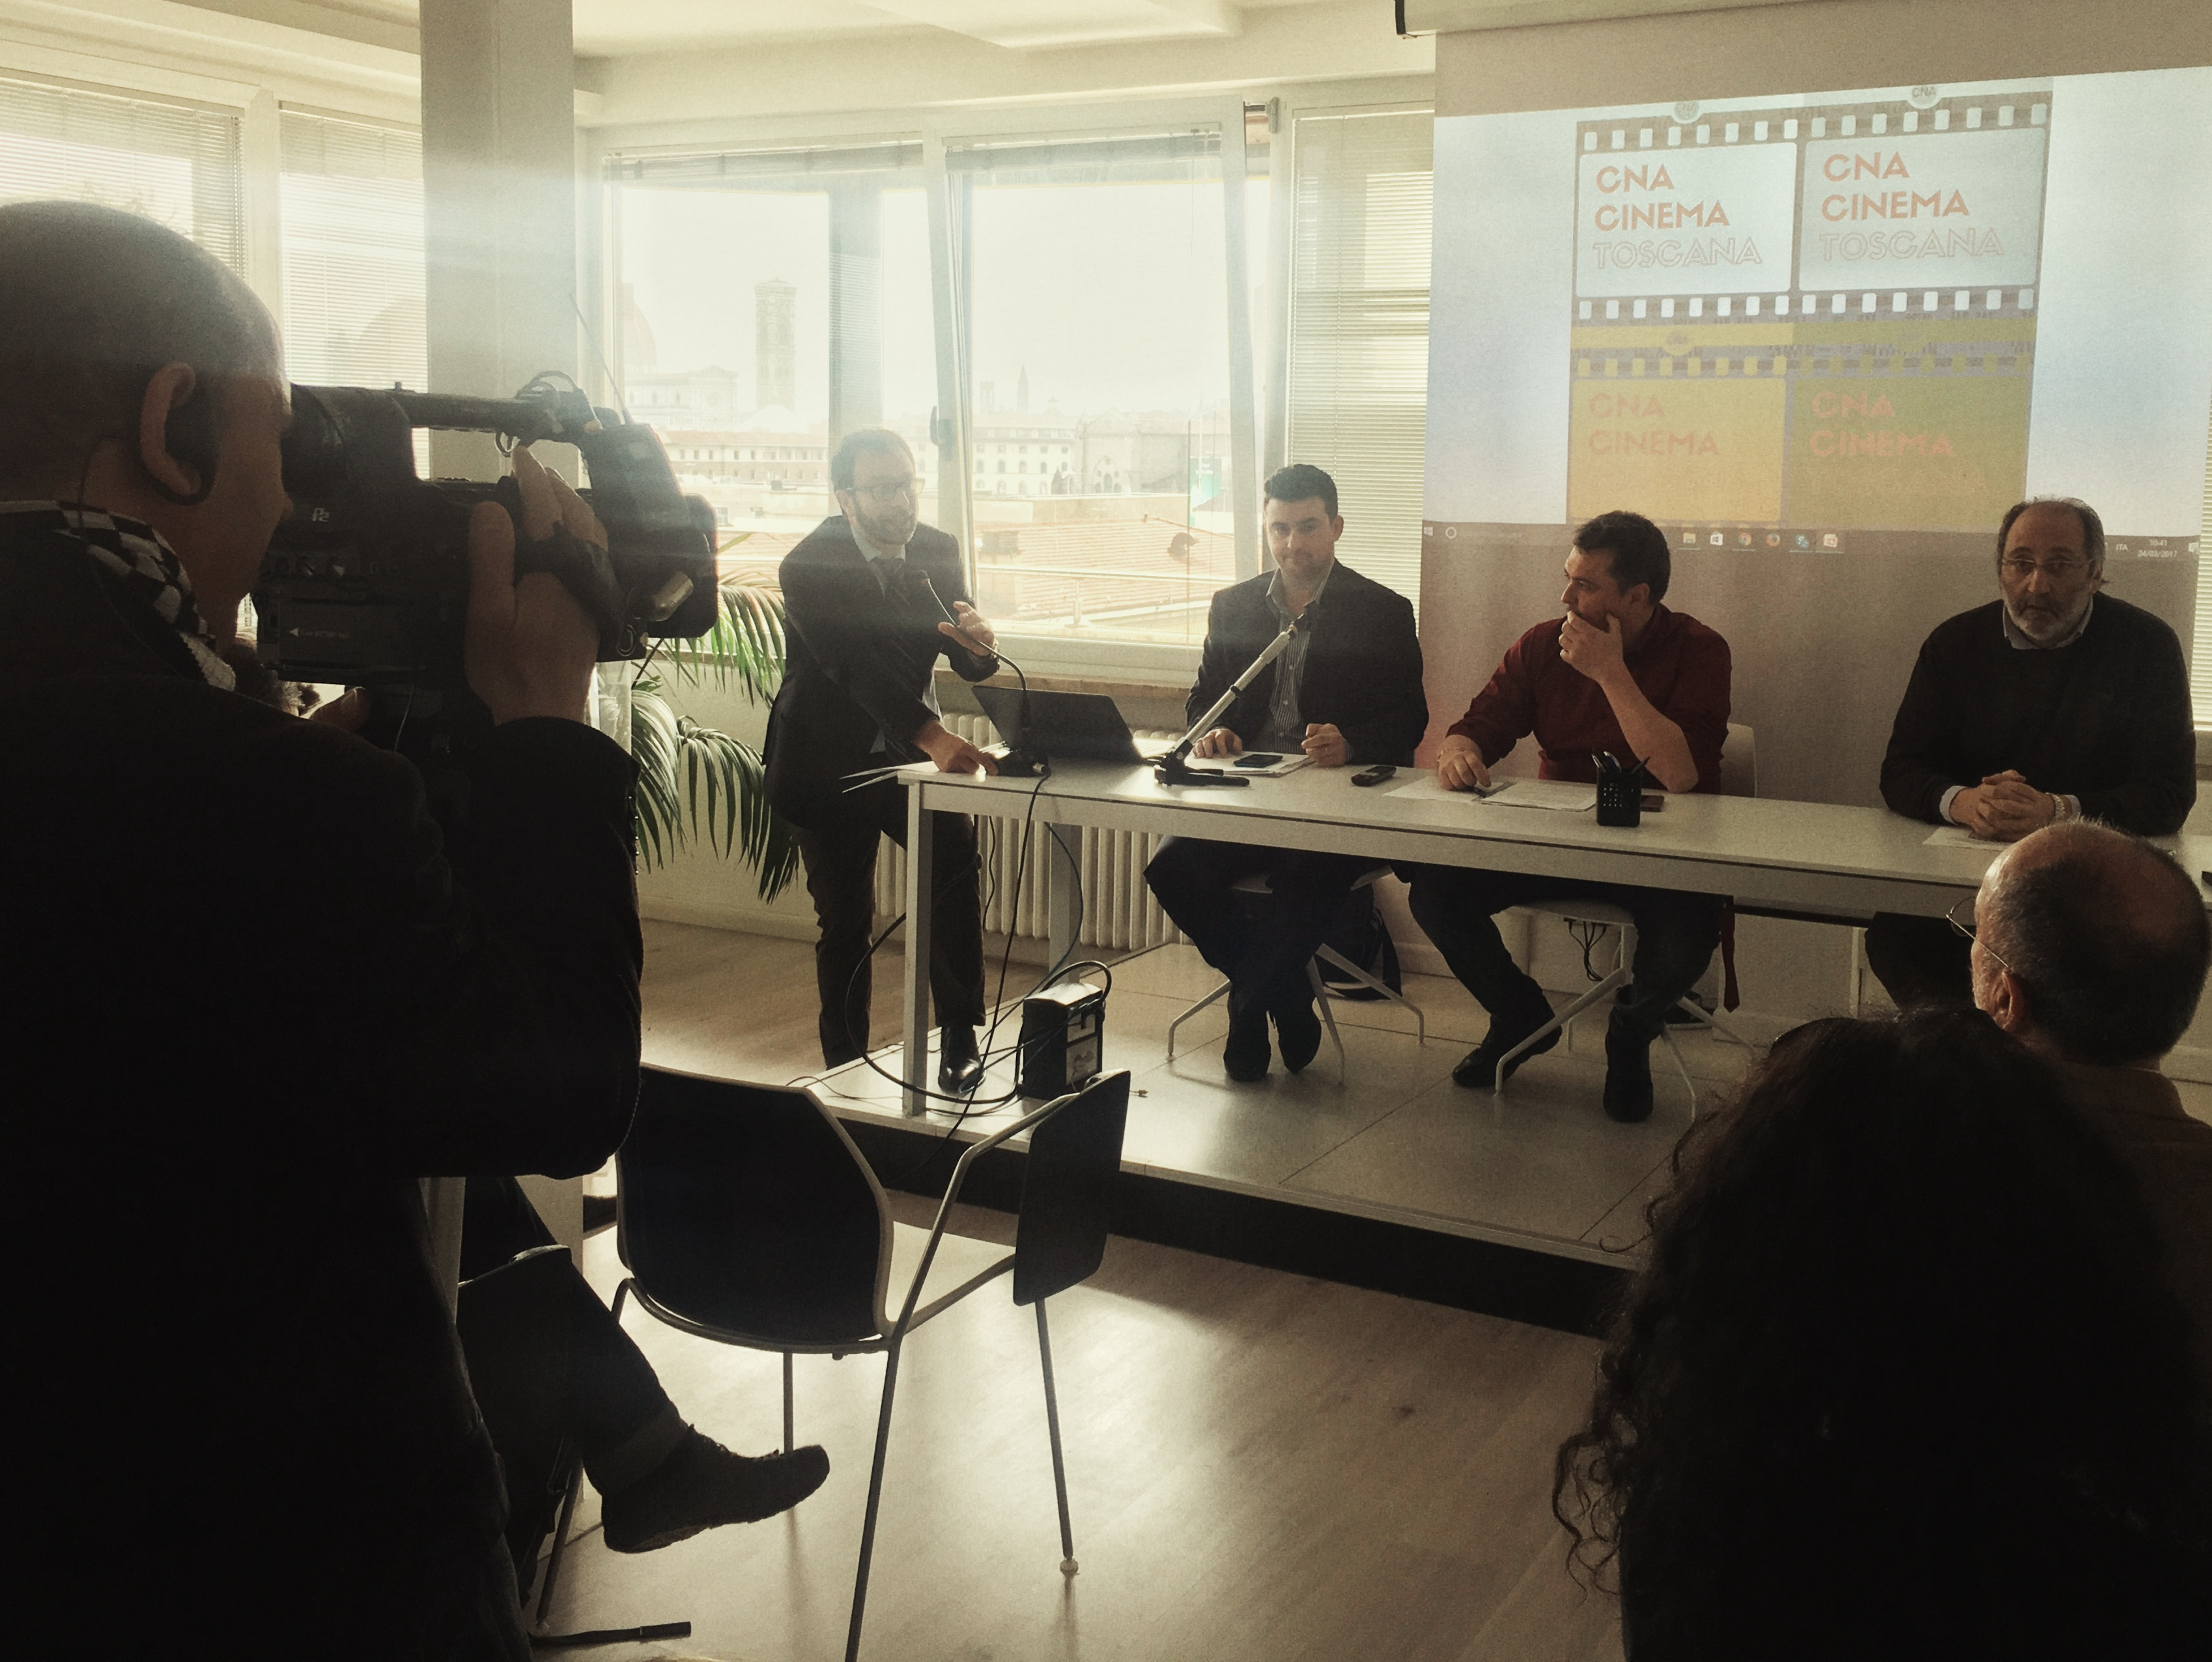 Toscana Film Network CNA Cinema Toscana